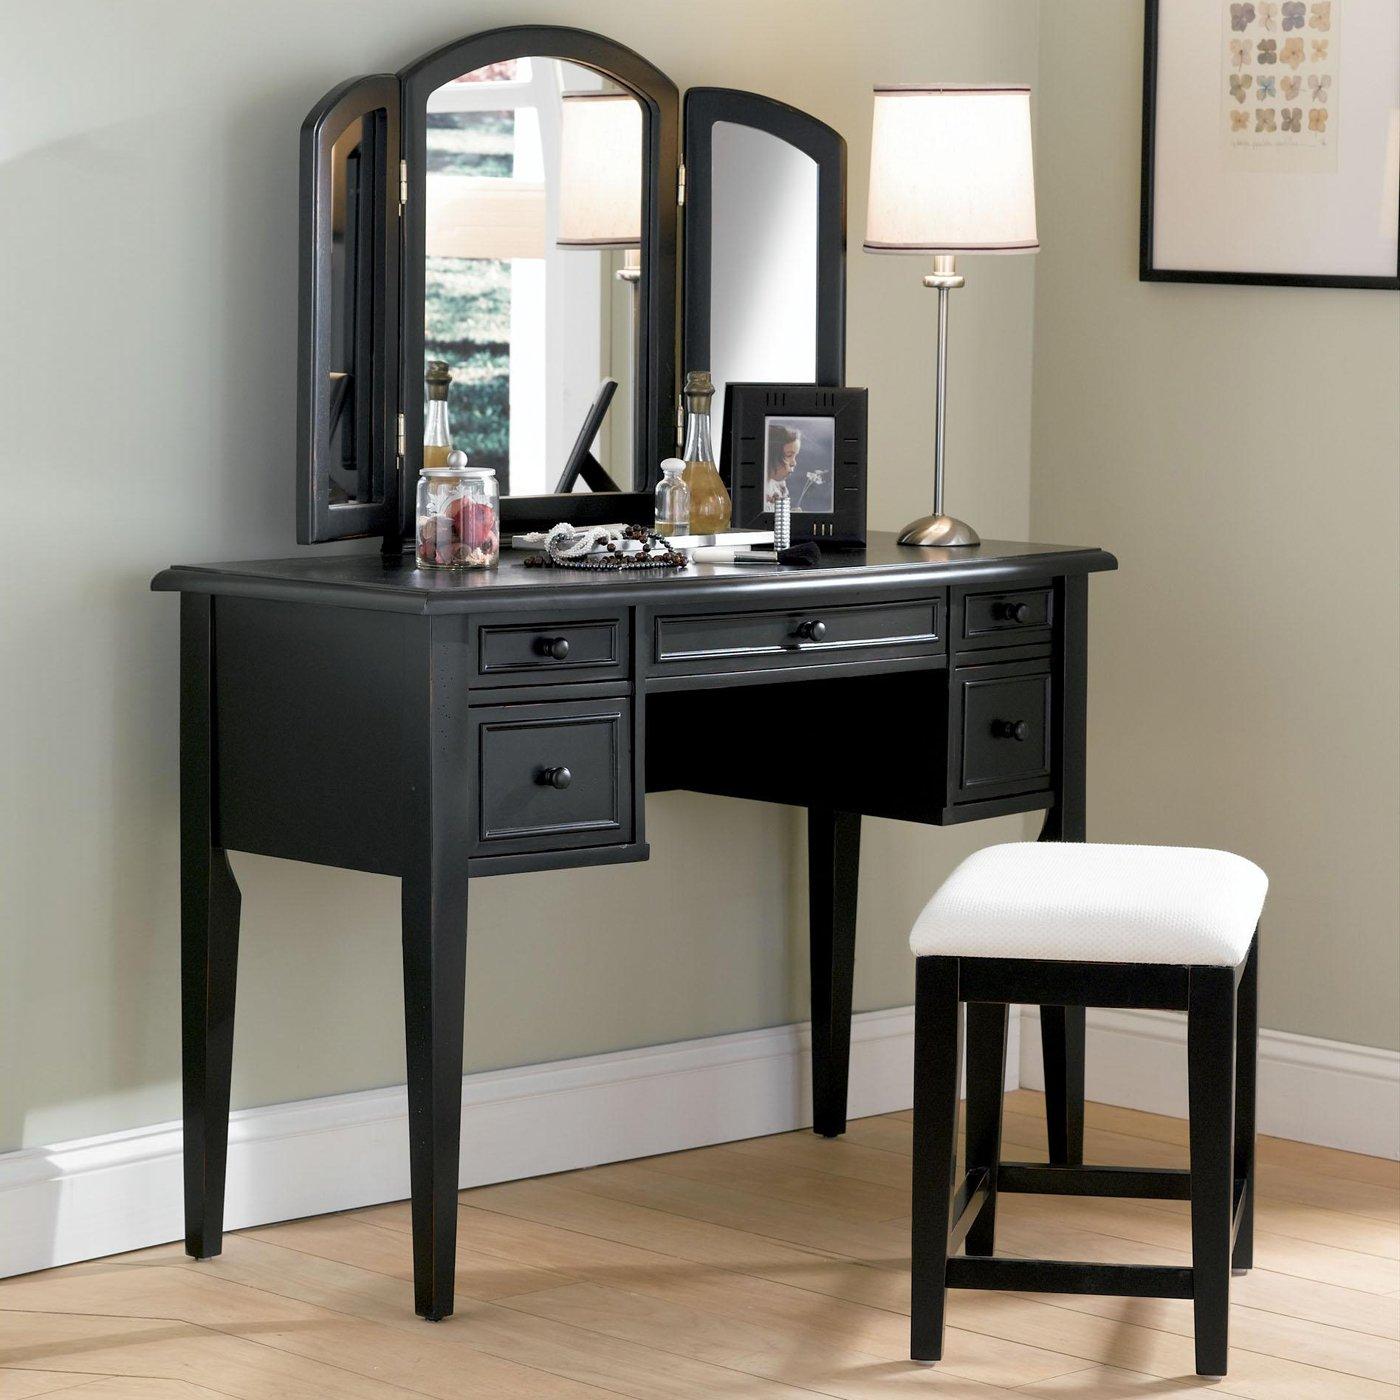 furniture-bedroom